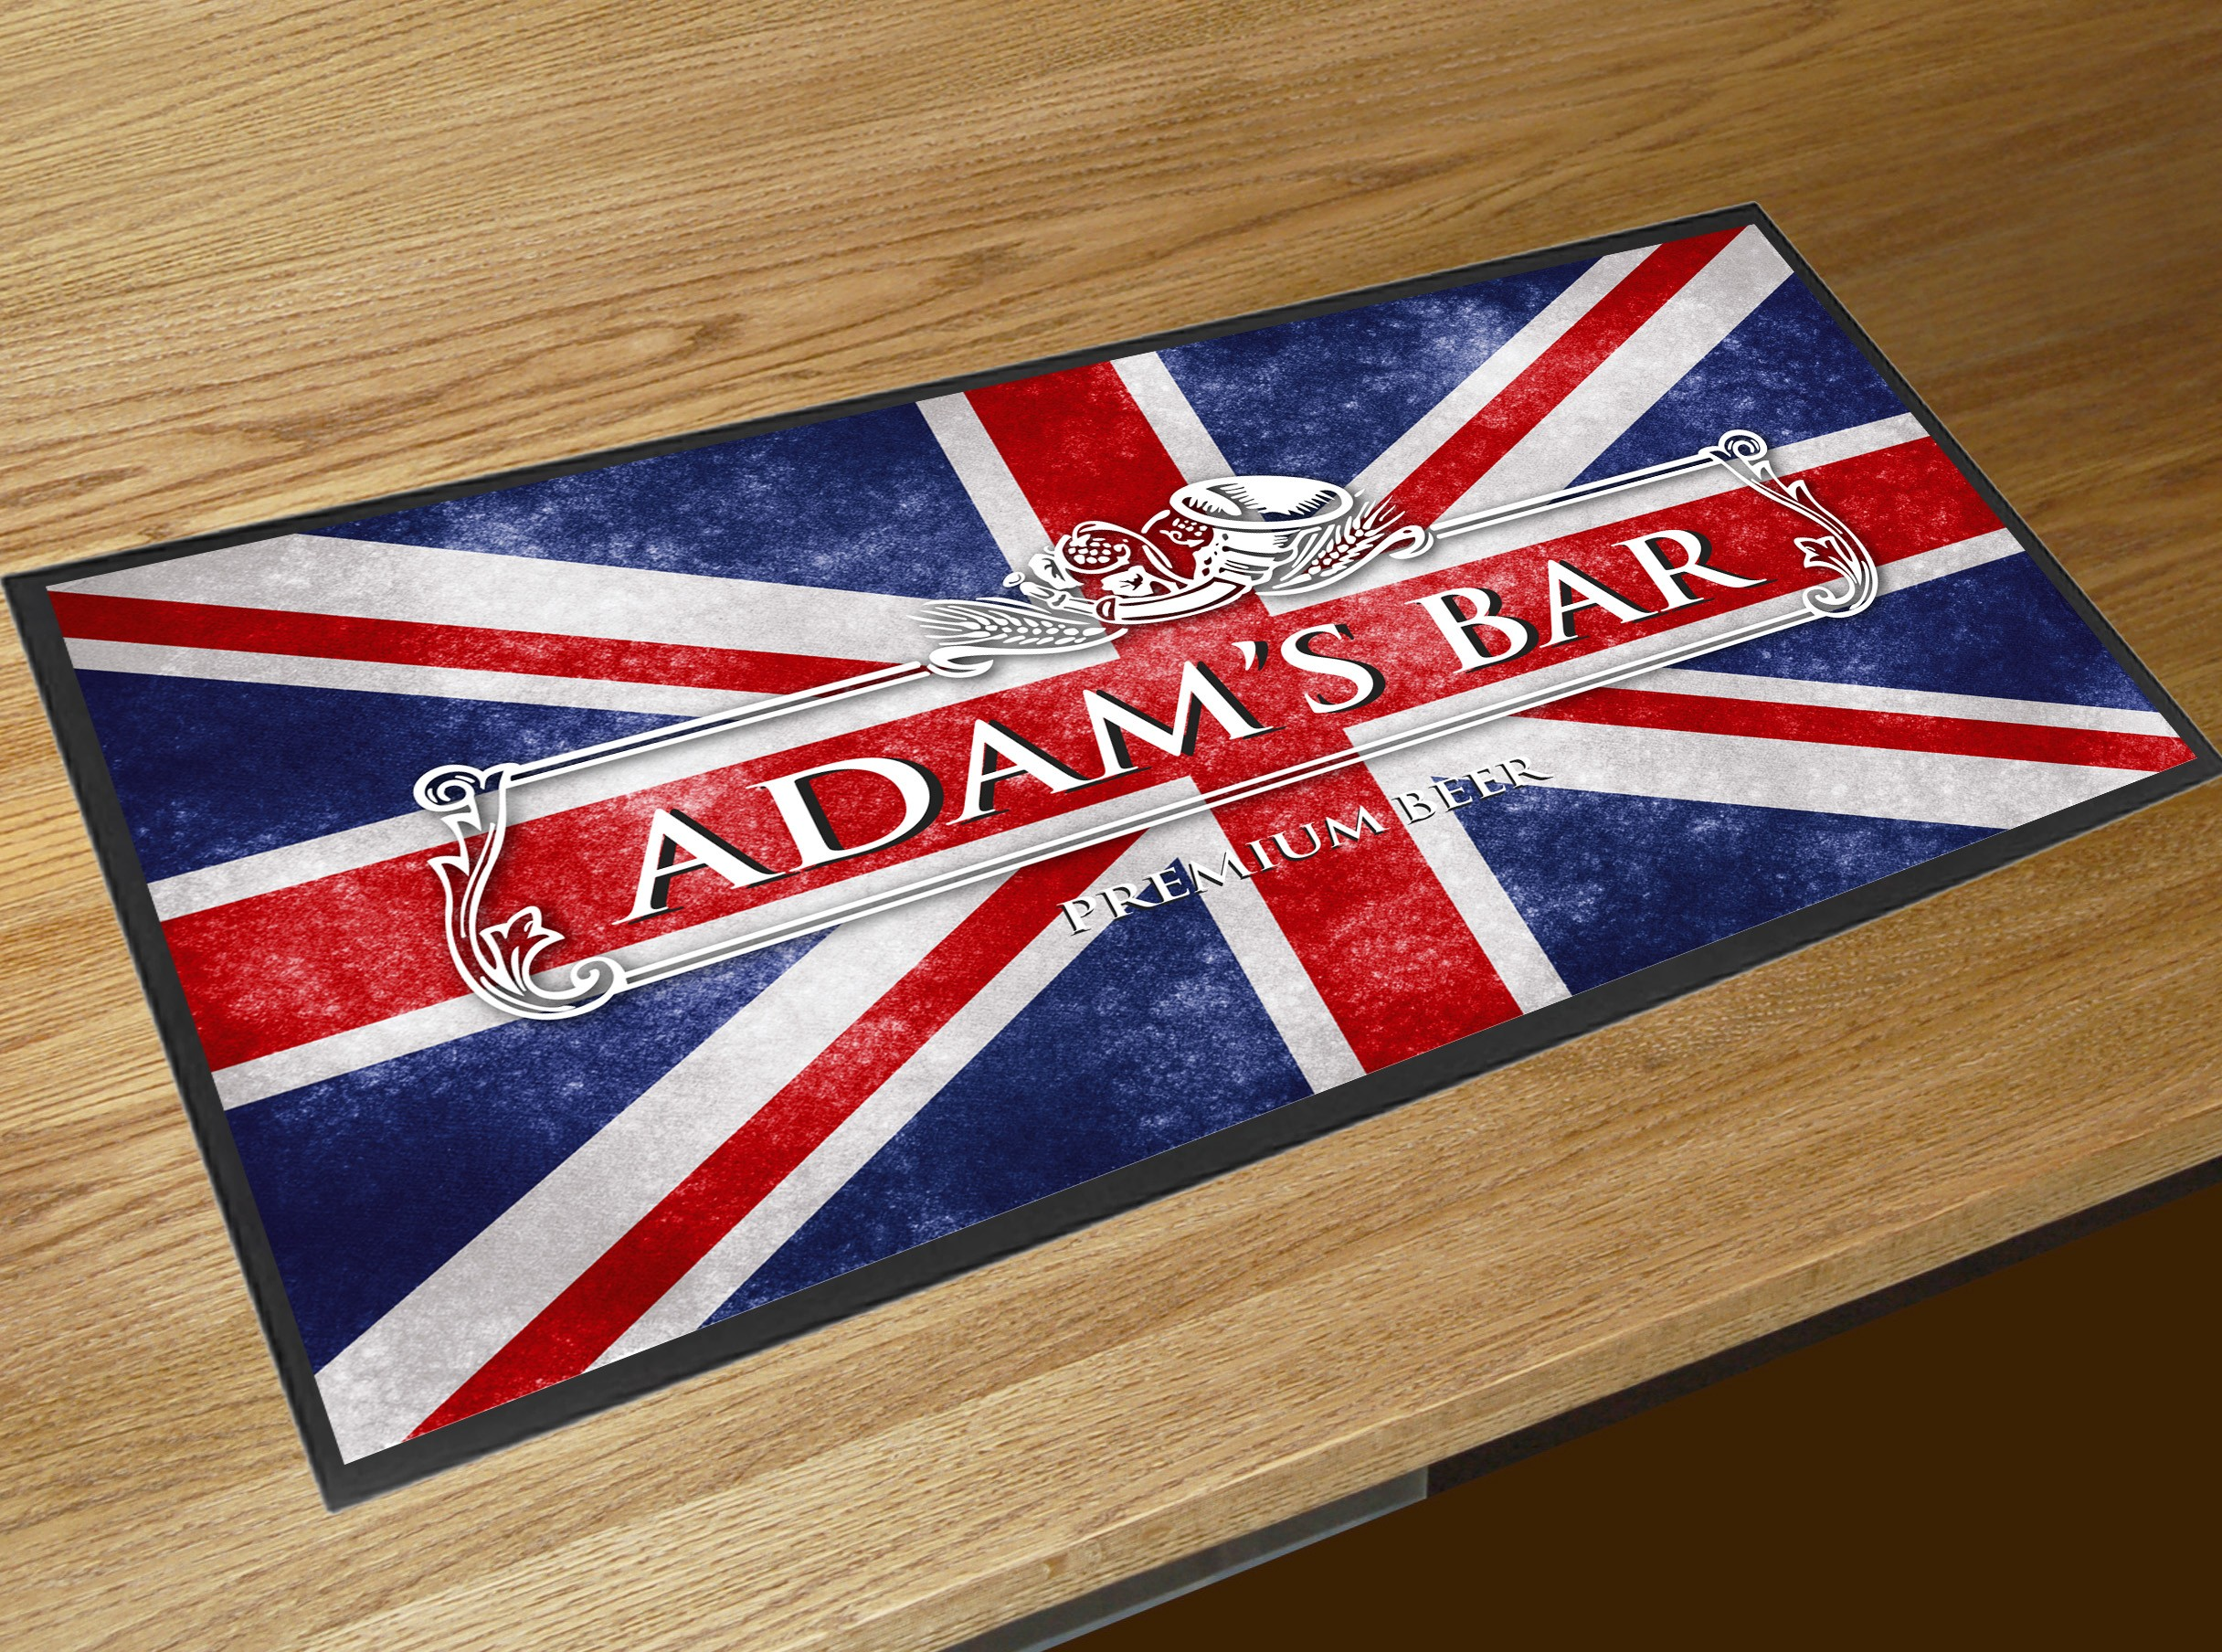 union jack bar Union Jack Club - The Premier Armed Forces Club in London